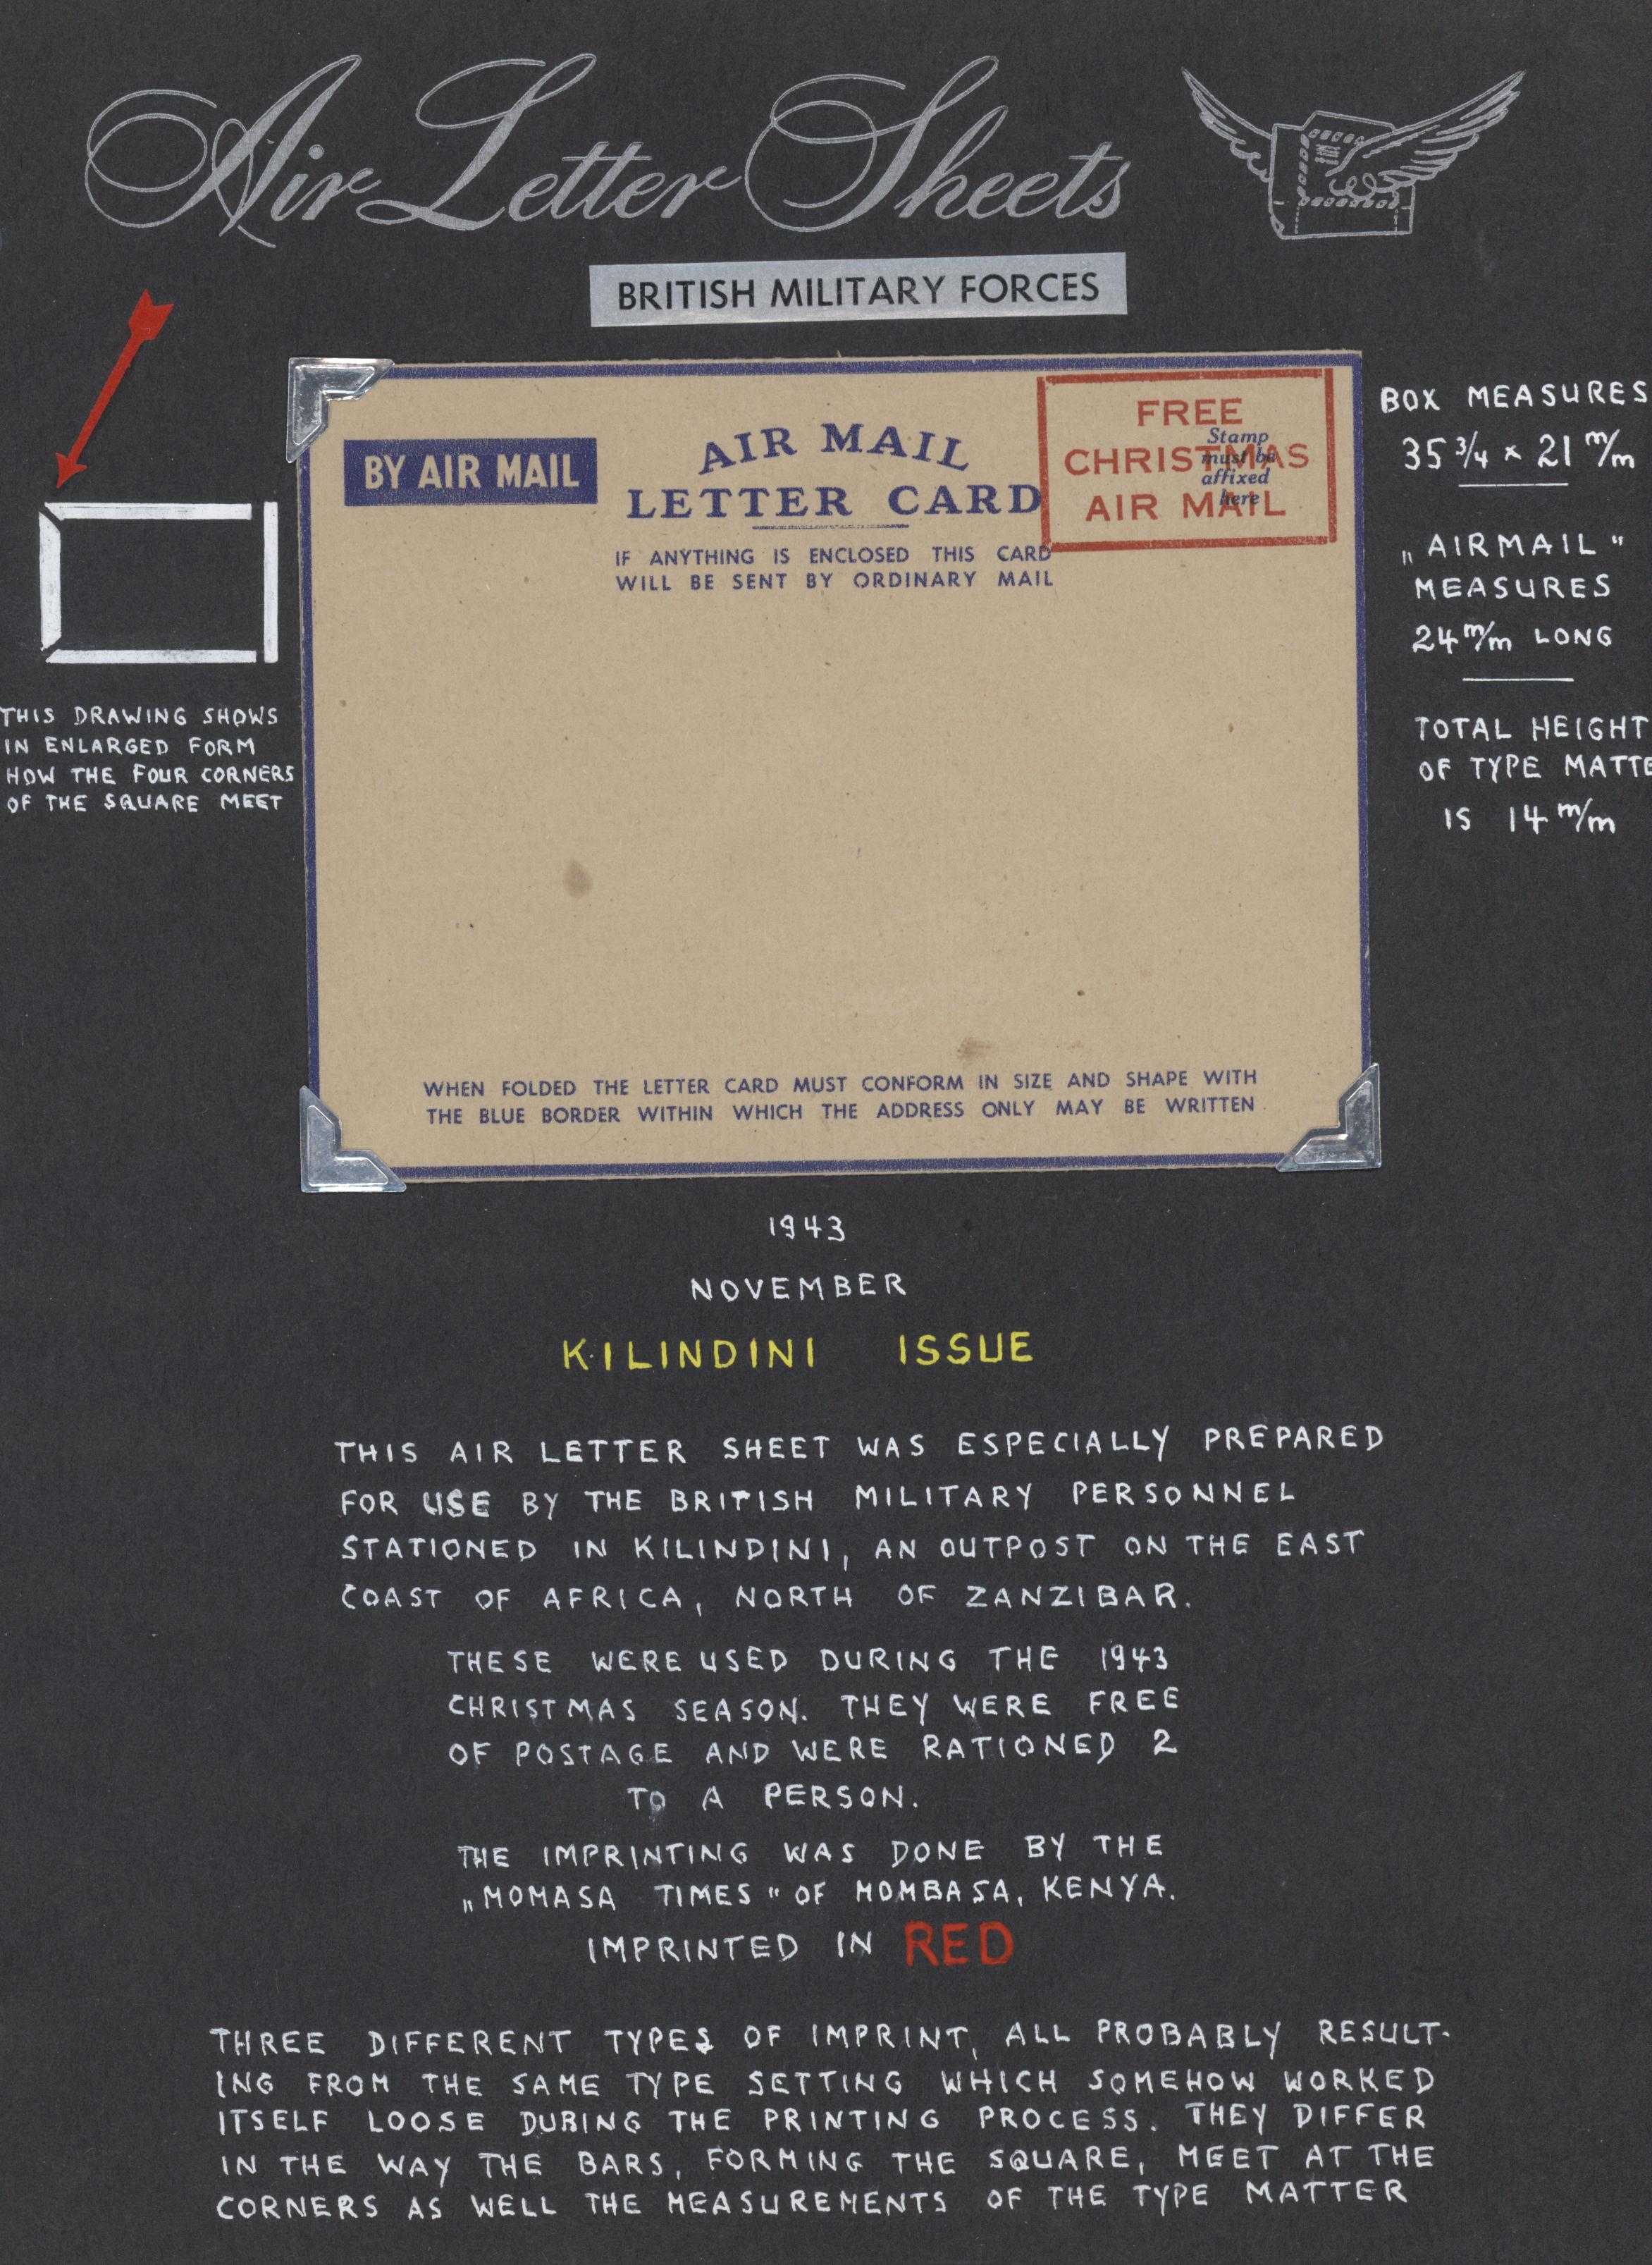 Lot 31821 - britische militärpost ii. wk  -  Auktionshaus Christoph Gärtner GmbH & Co. KG Sale #44 Collections Overseas, Europe